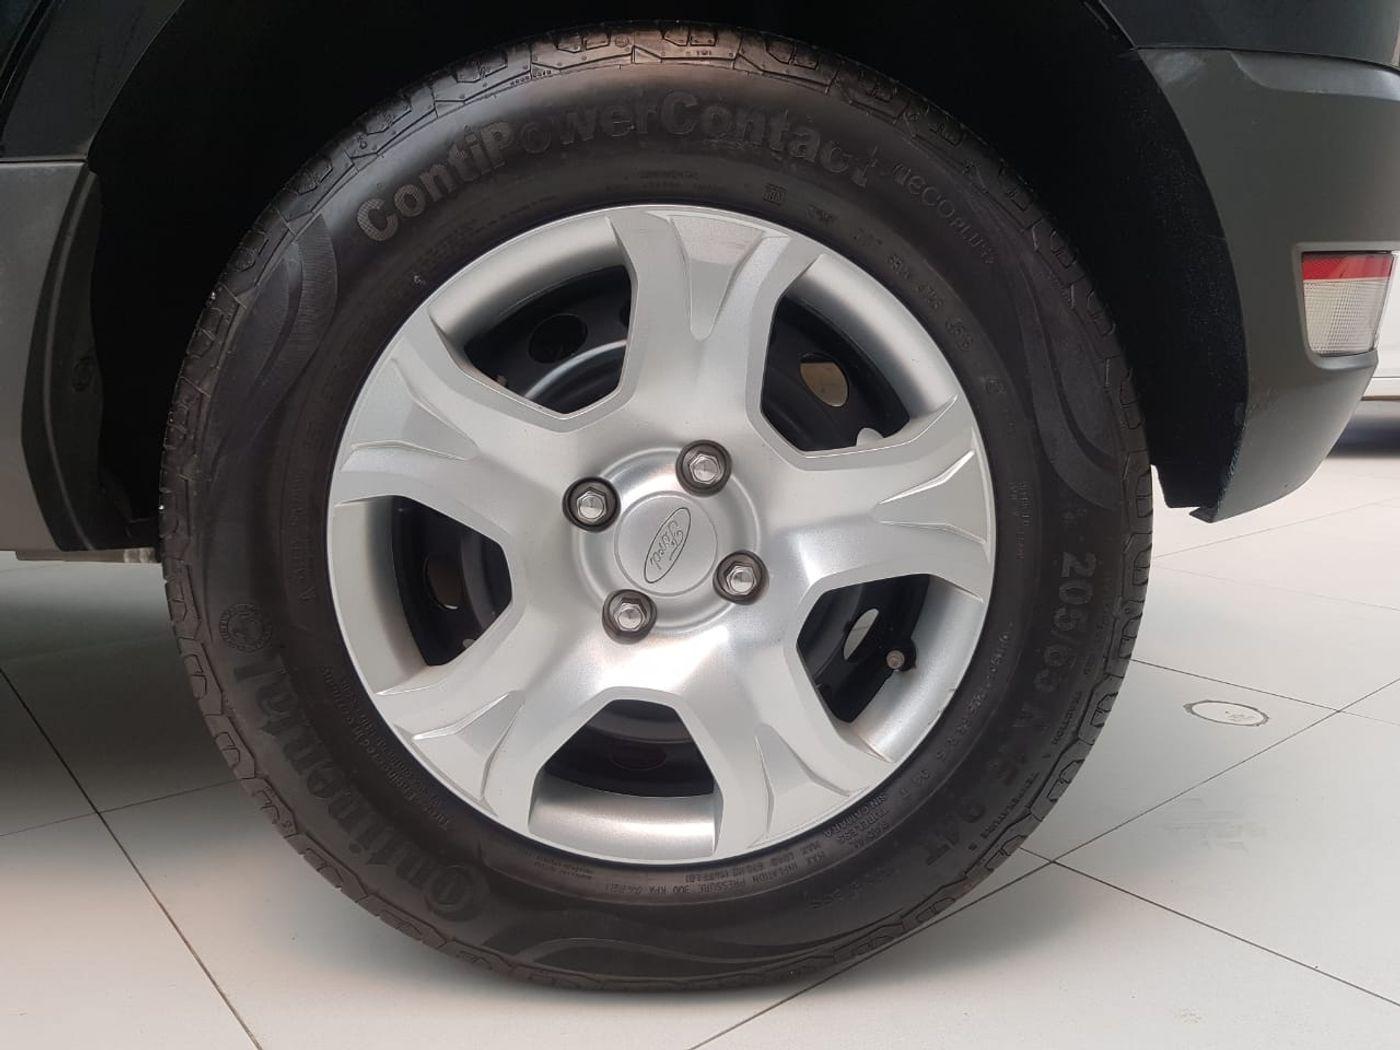 Ford EcoSport SE 1.6 16V Flex 5p Aut.